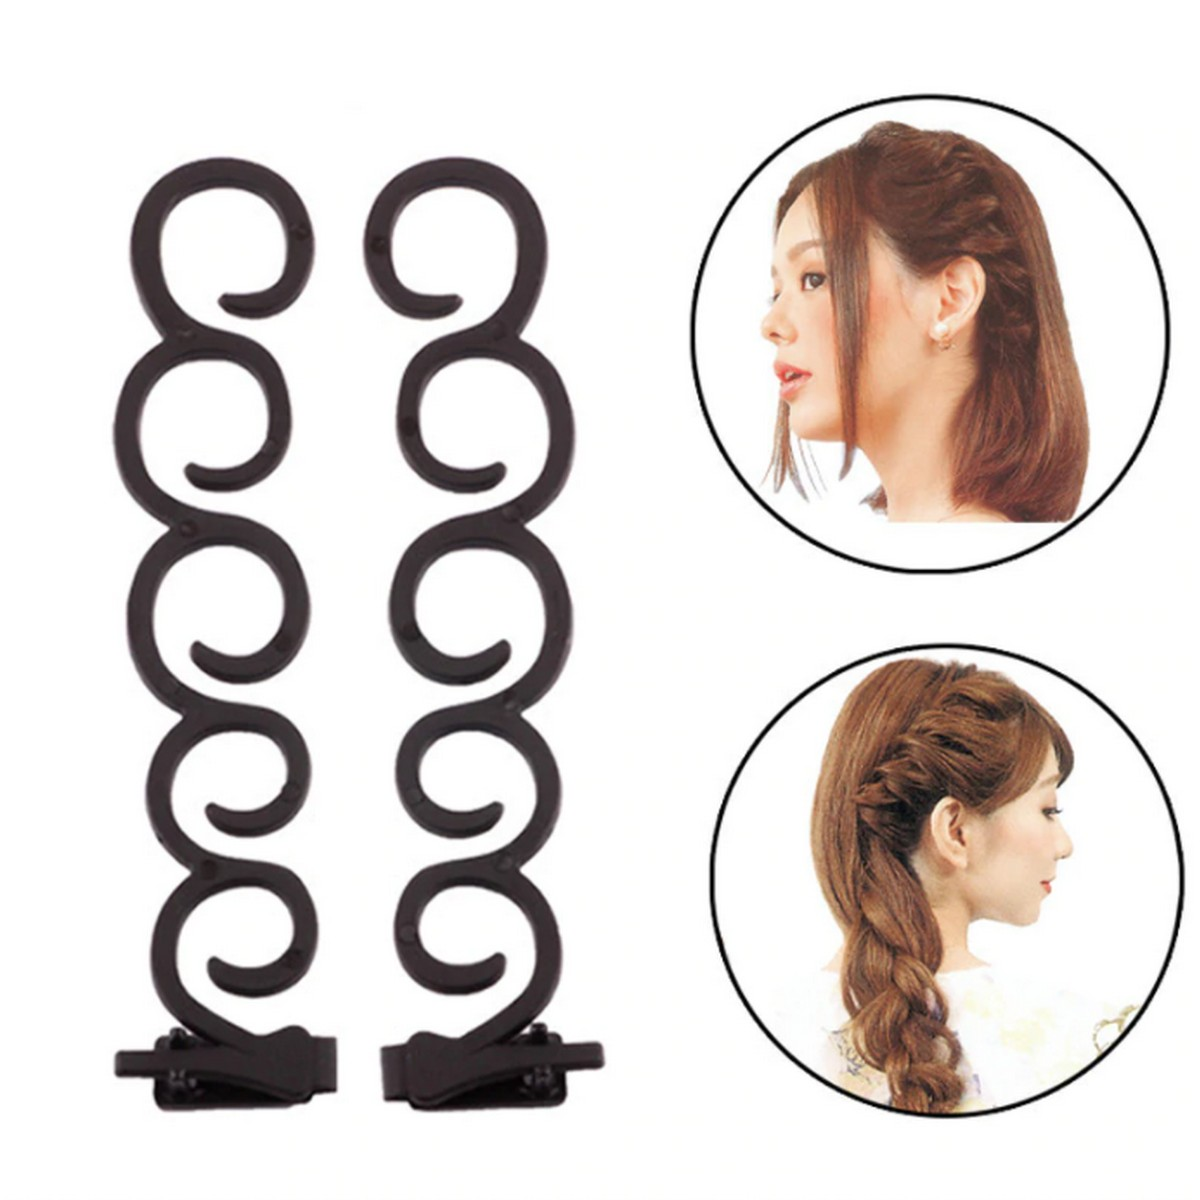 2pcs Hair Styling Tools Weave Braid Hair Brander FOR Females